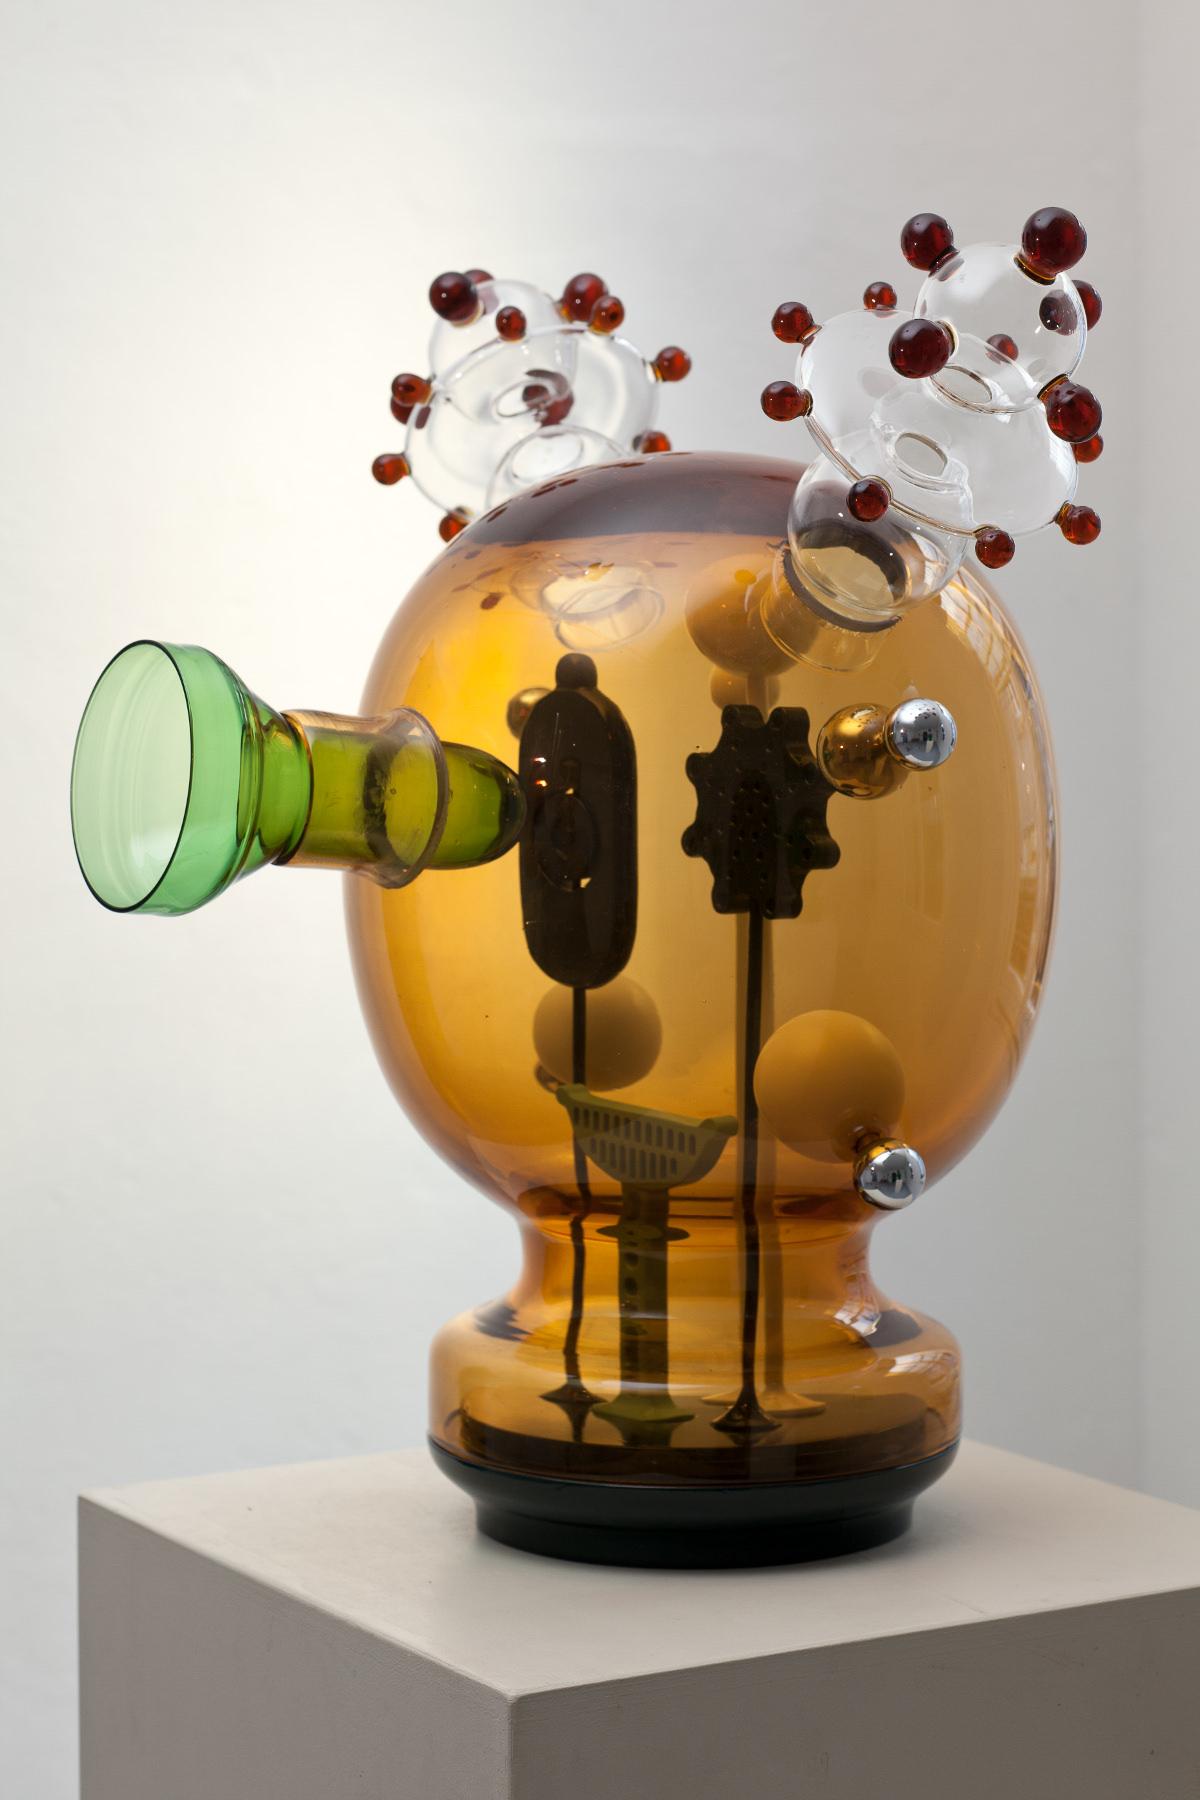 Jaime Hayon - Testa Mecanica